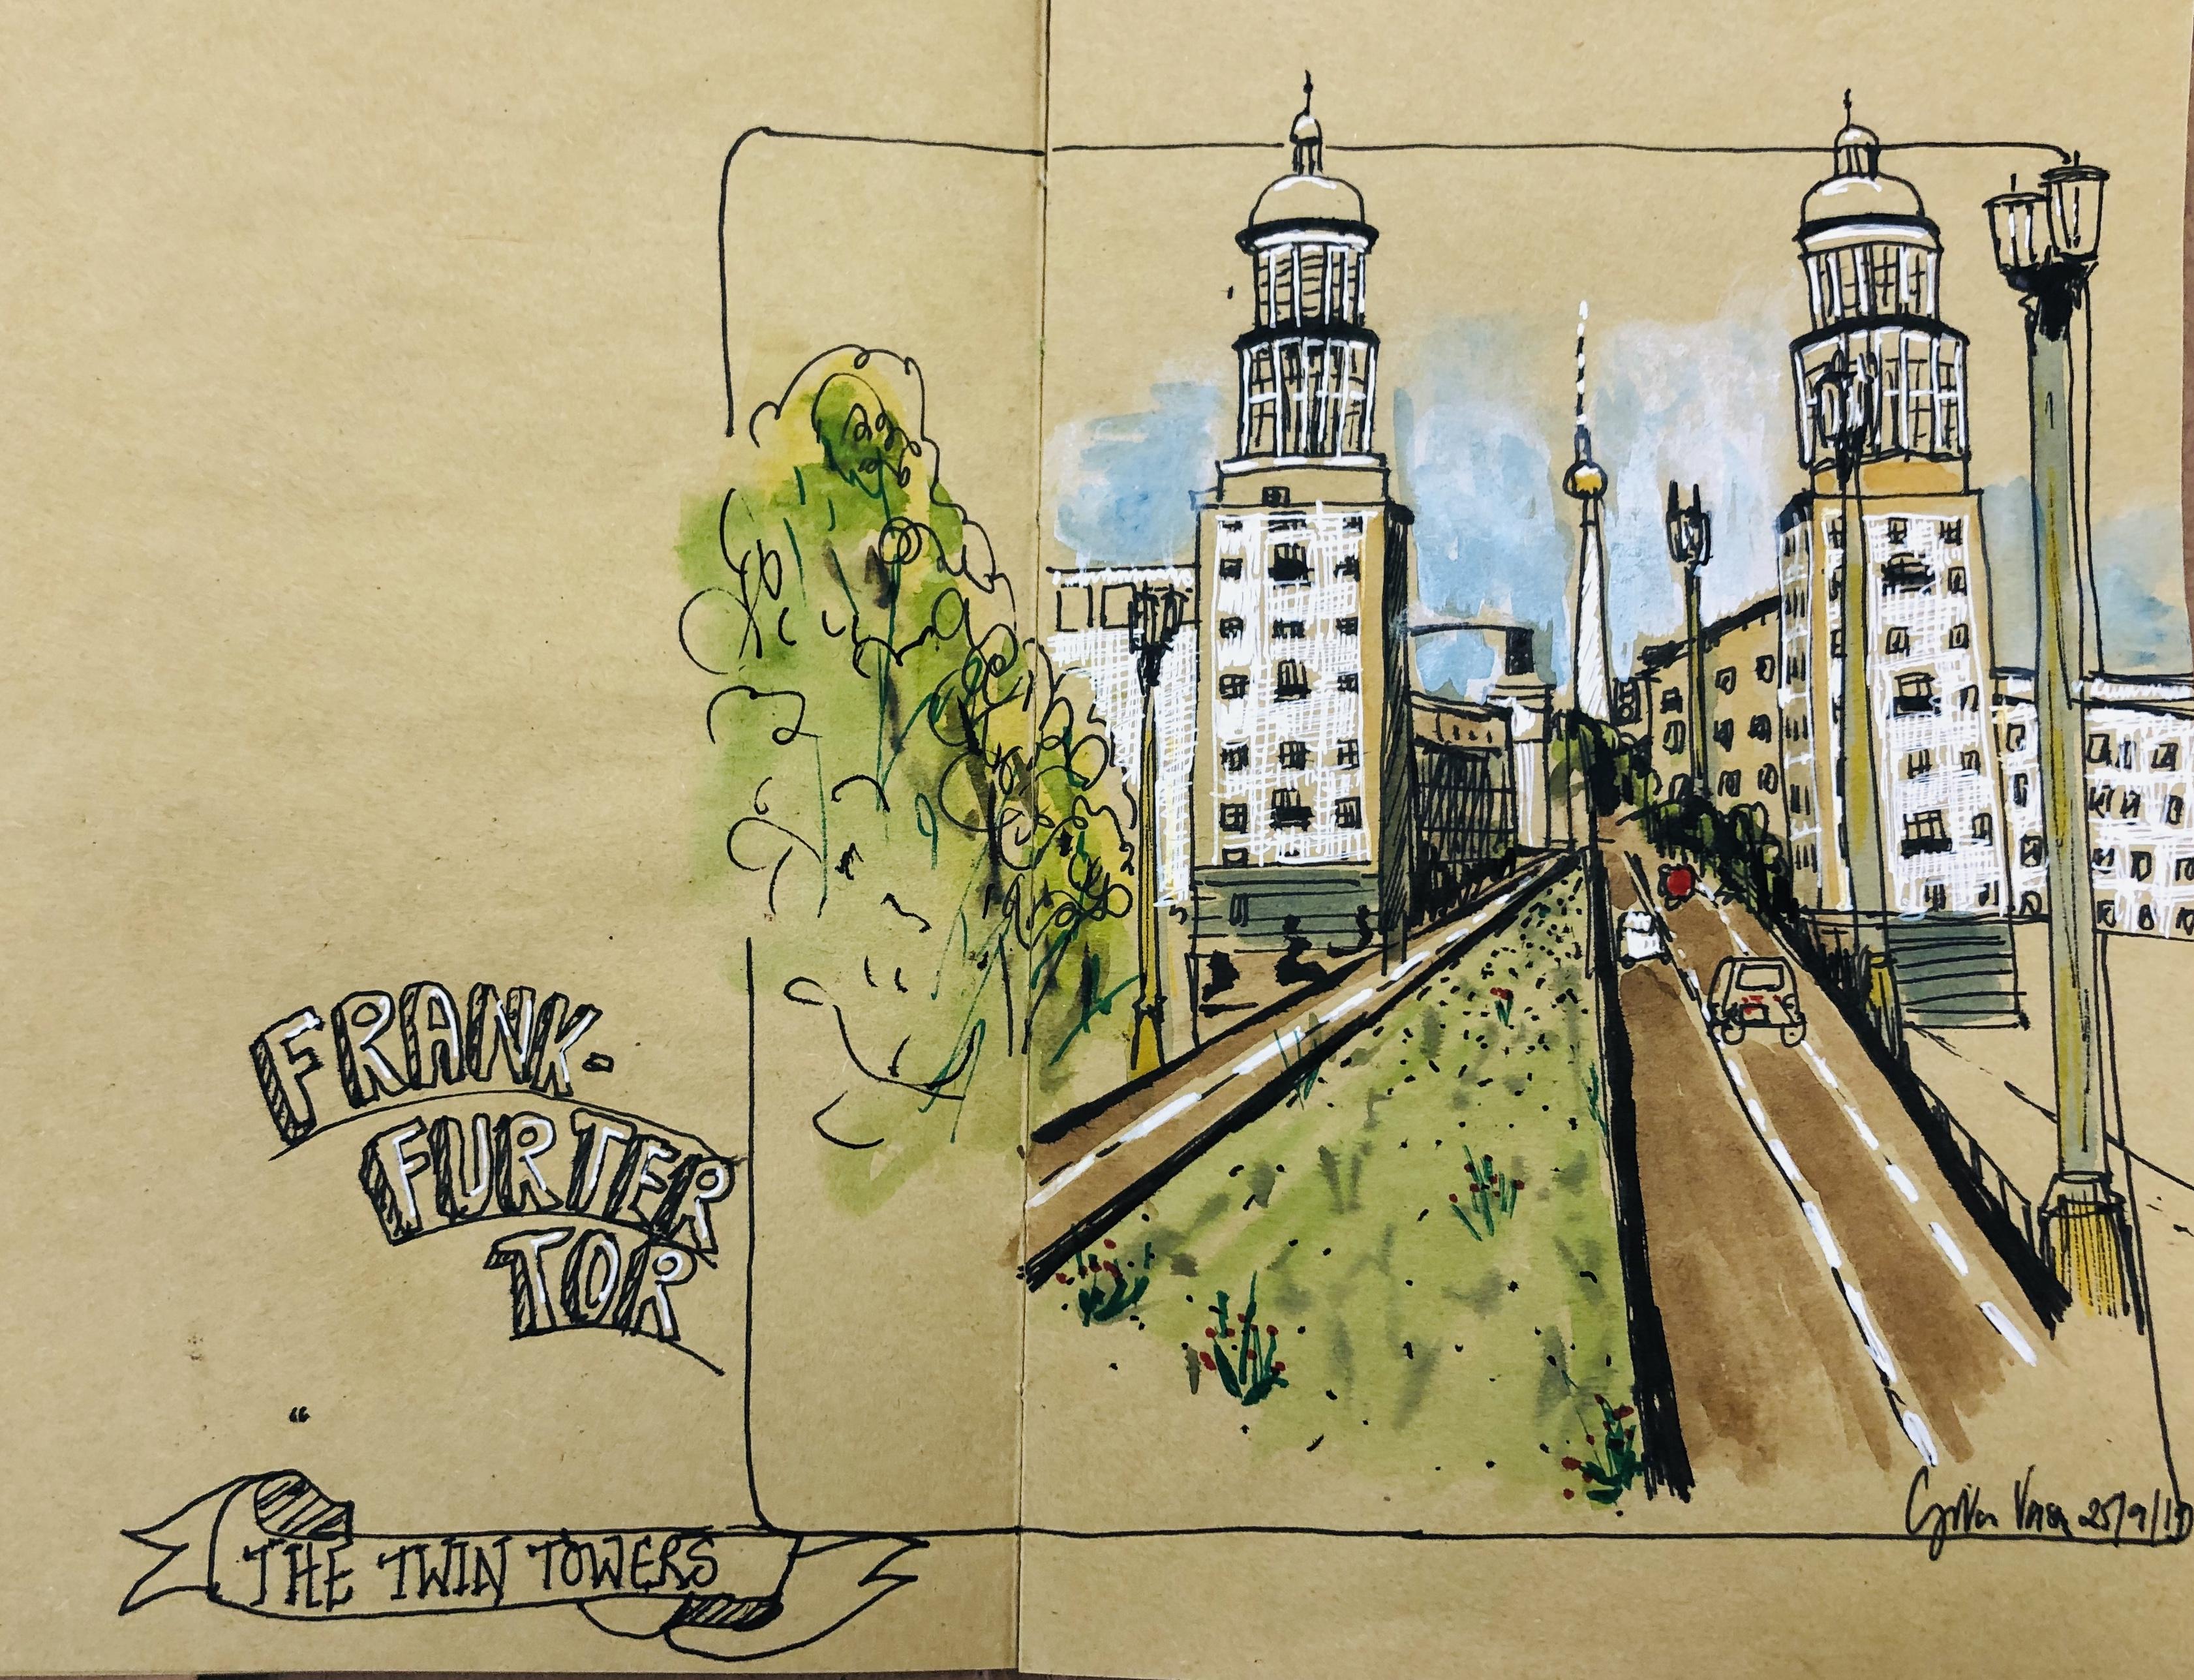 Frankfurter Tor - urban sketch